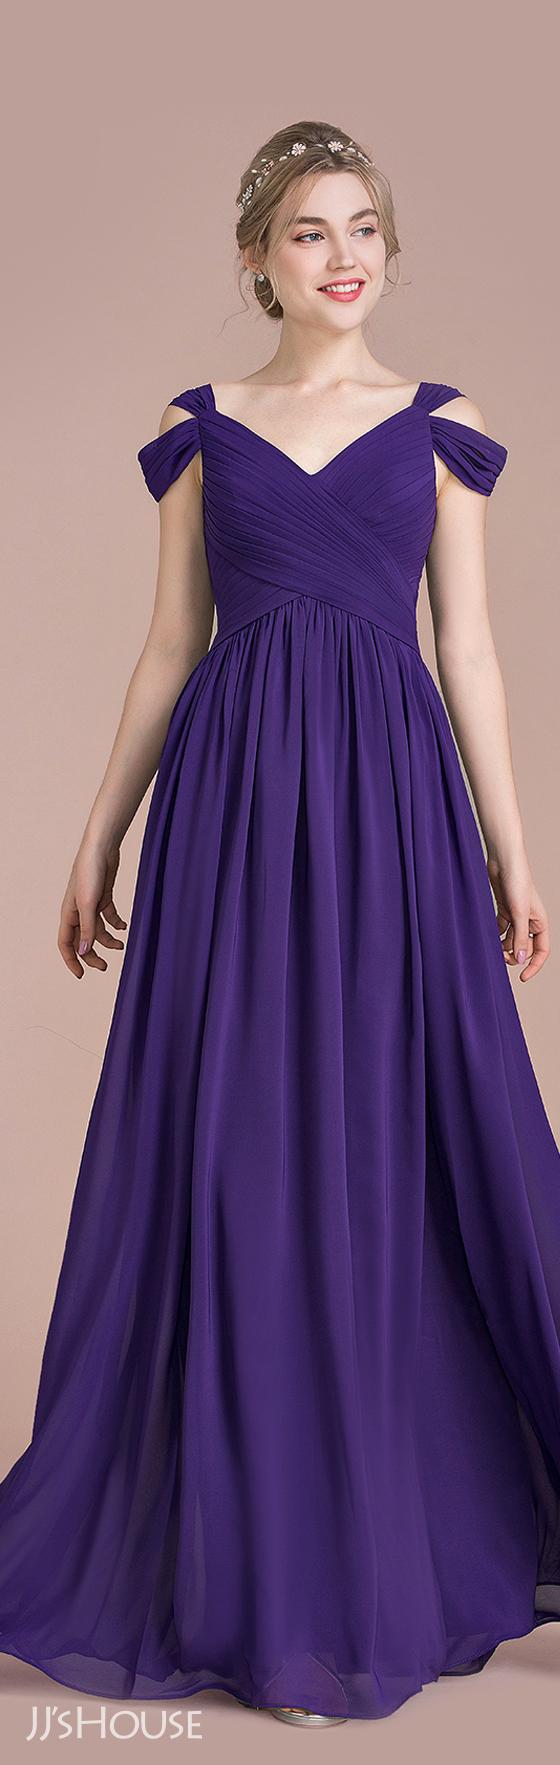 JJsHouse #Bridesmaid | Lilás/Violeta/Roxo | Pinterest | Vestiditos ...